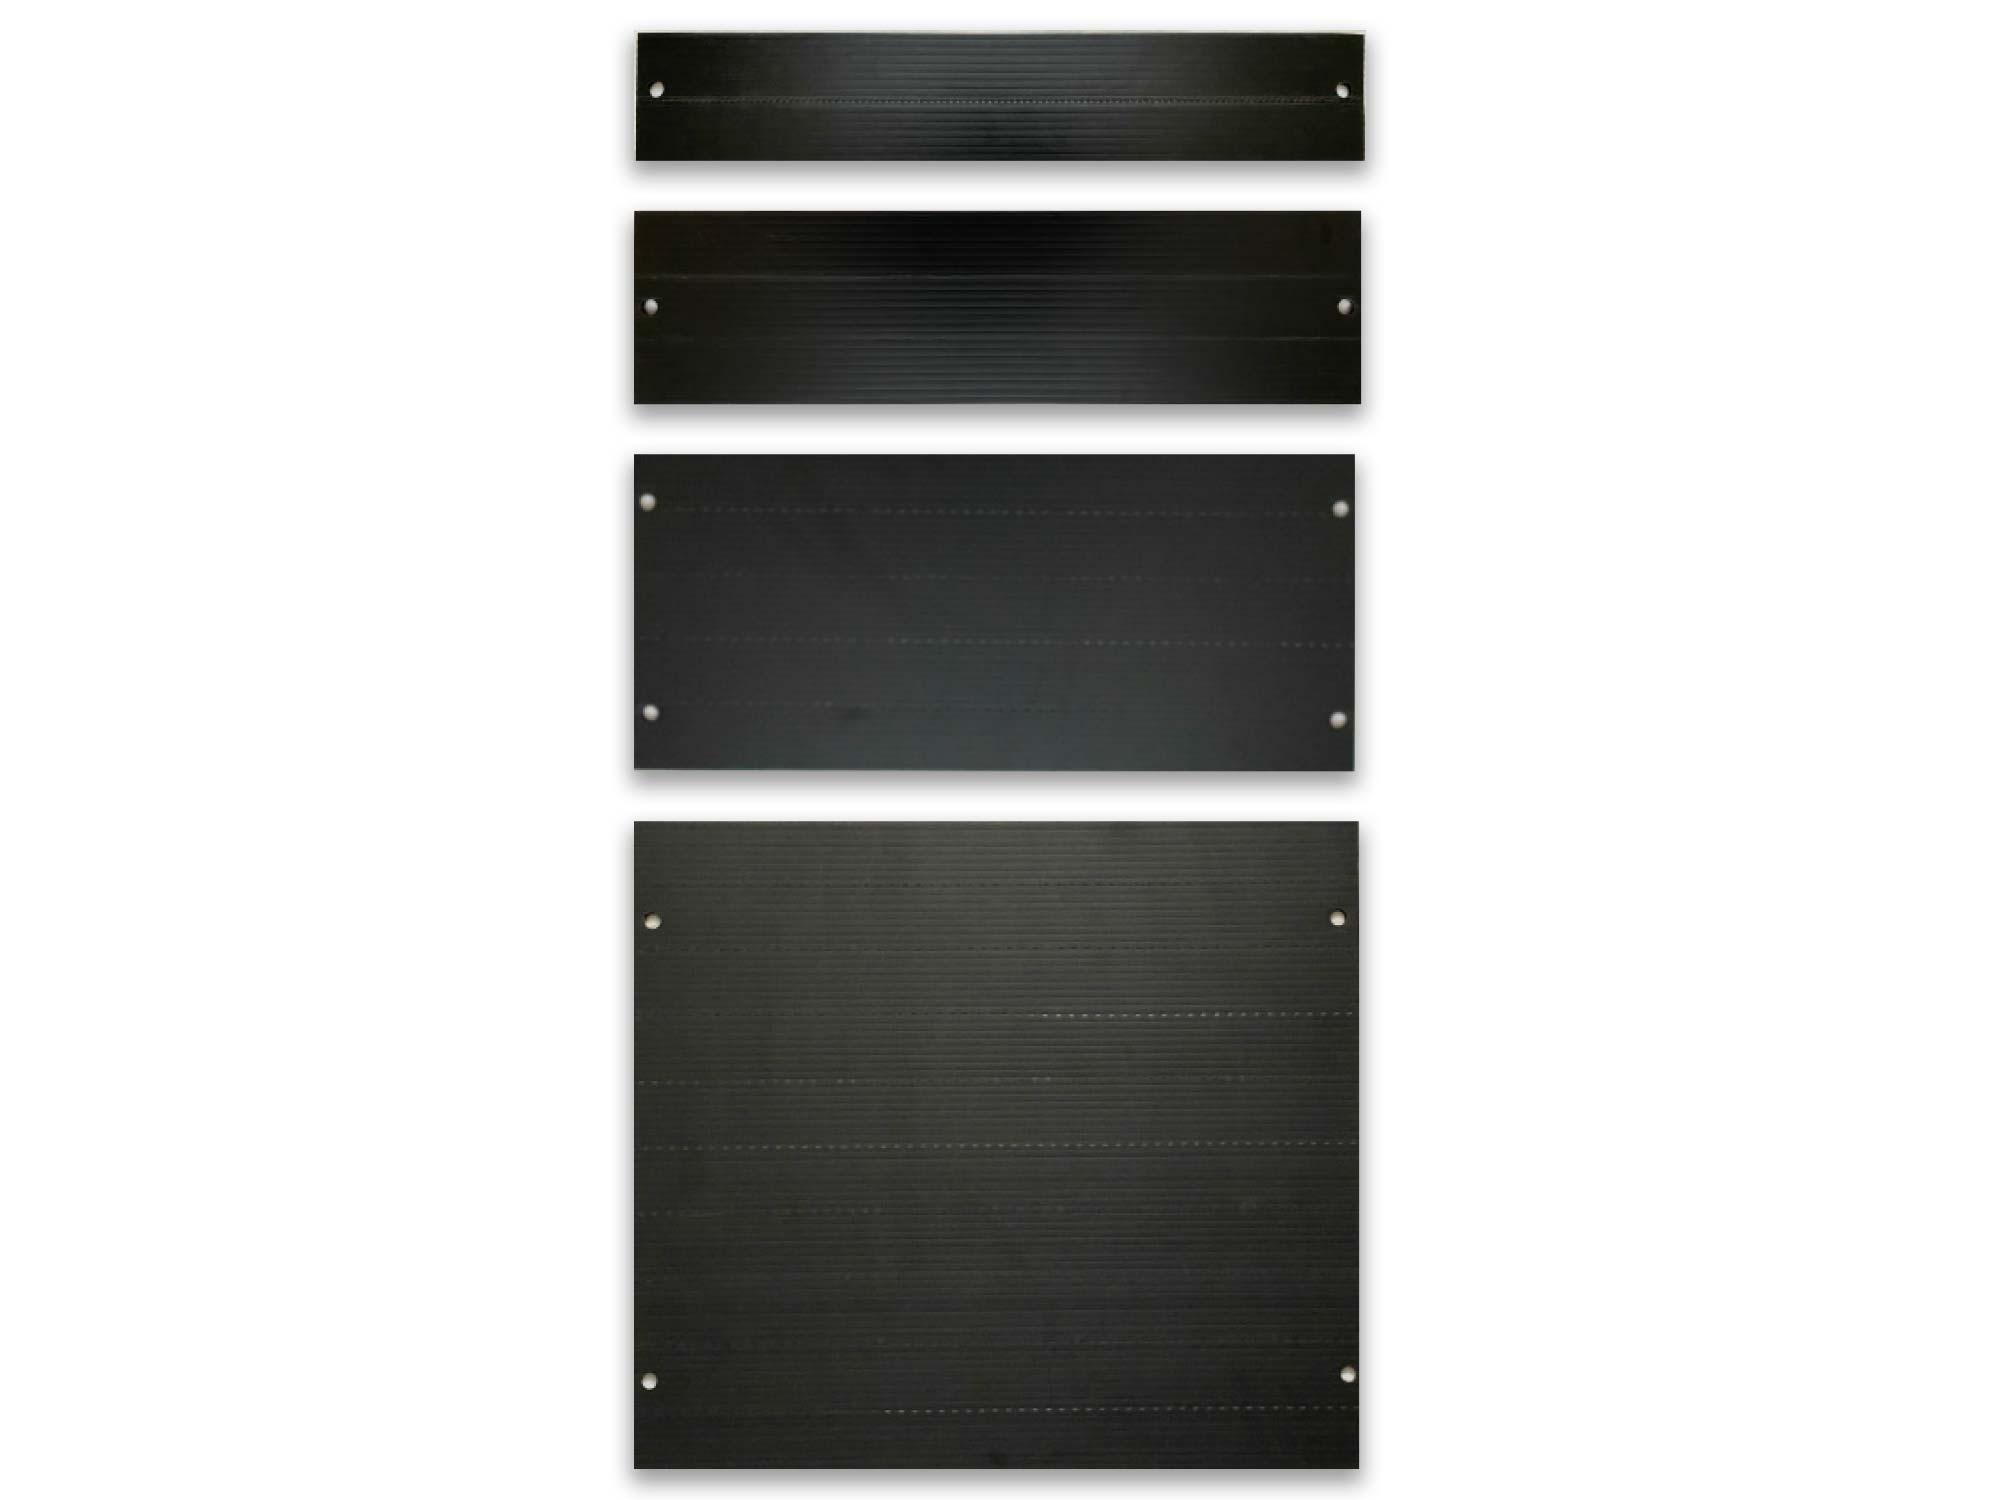 Rackfill Blanking Panels Kits - Should You Fill Rack Blanking Panels?